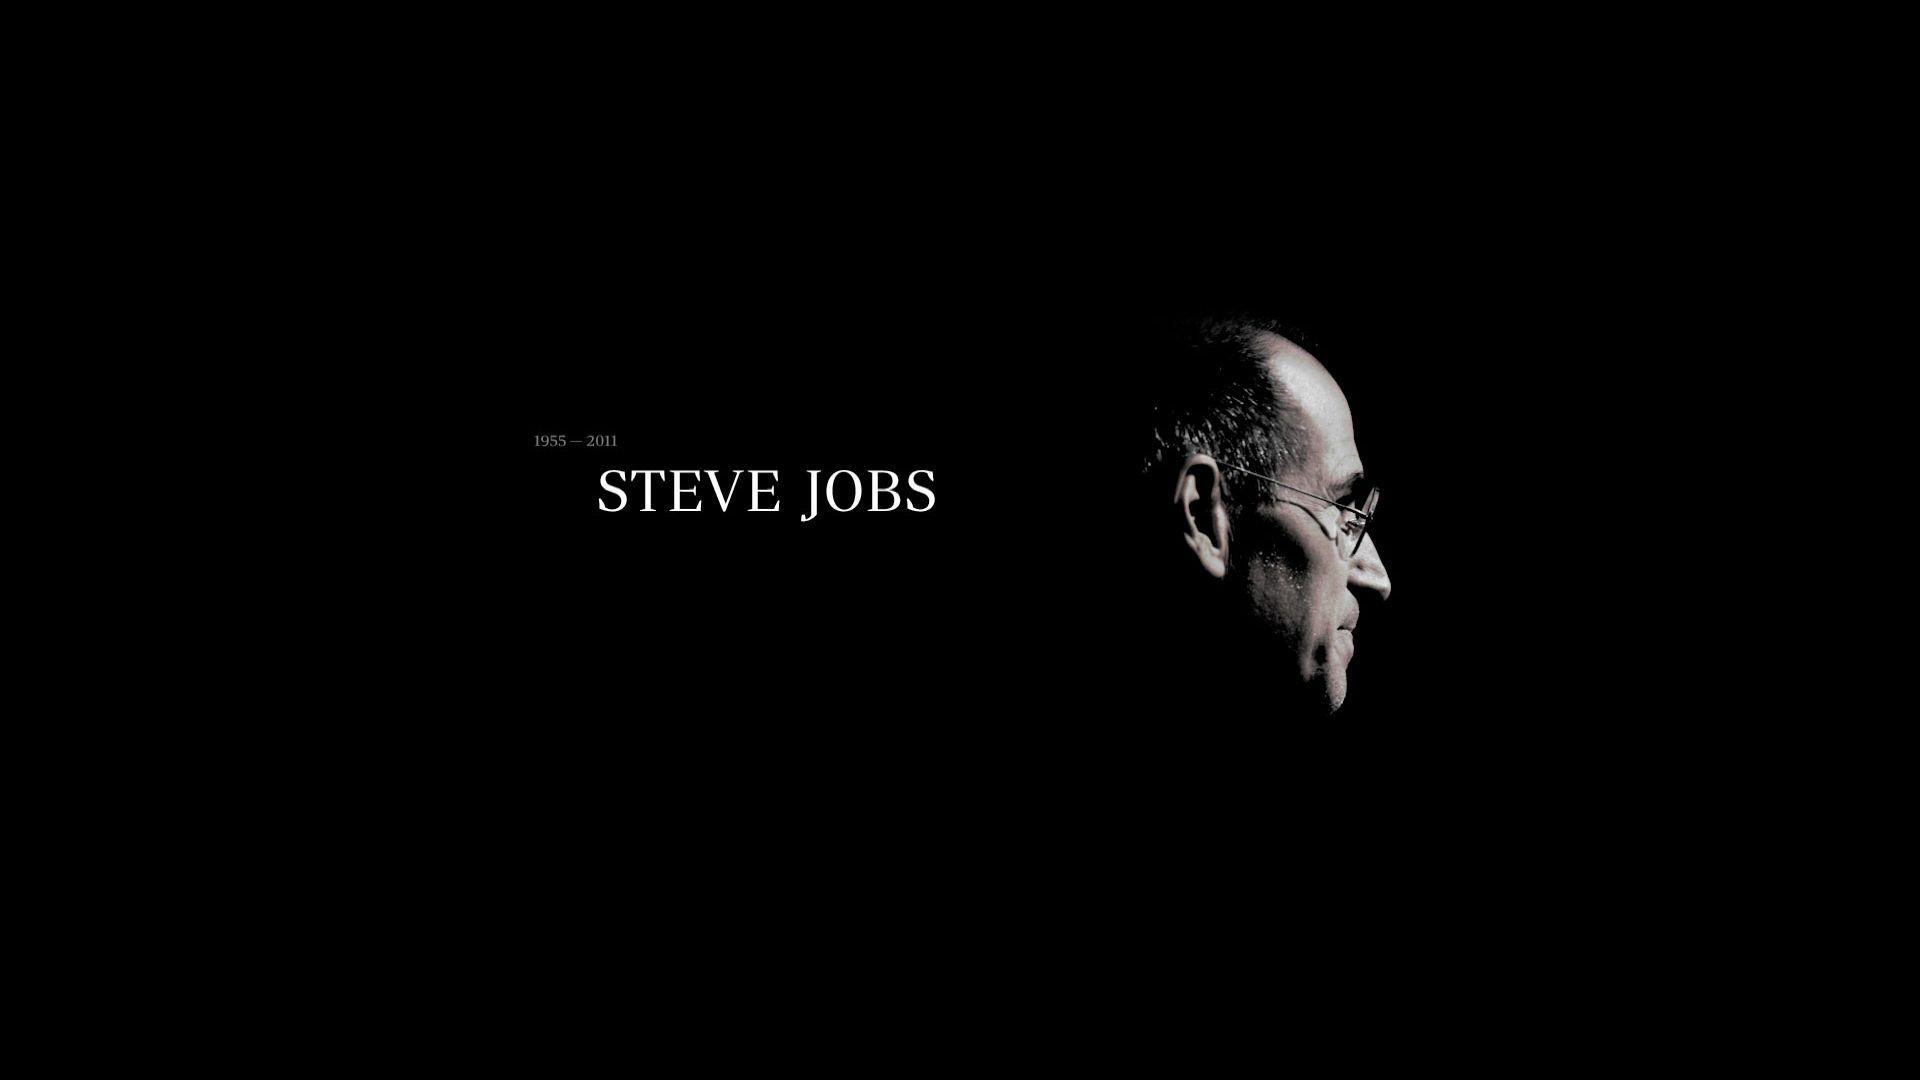 Rip steve jobs celebrity - Steve jobs wallpaper download ...